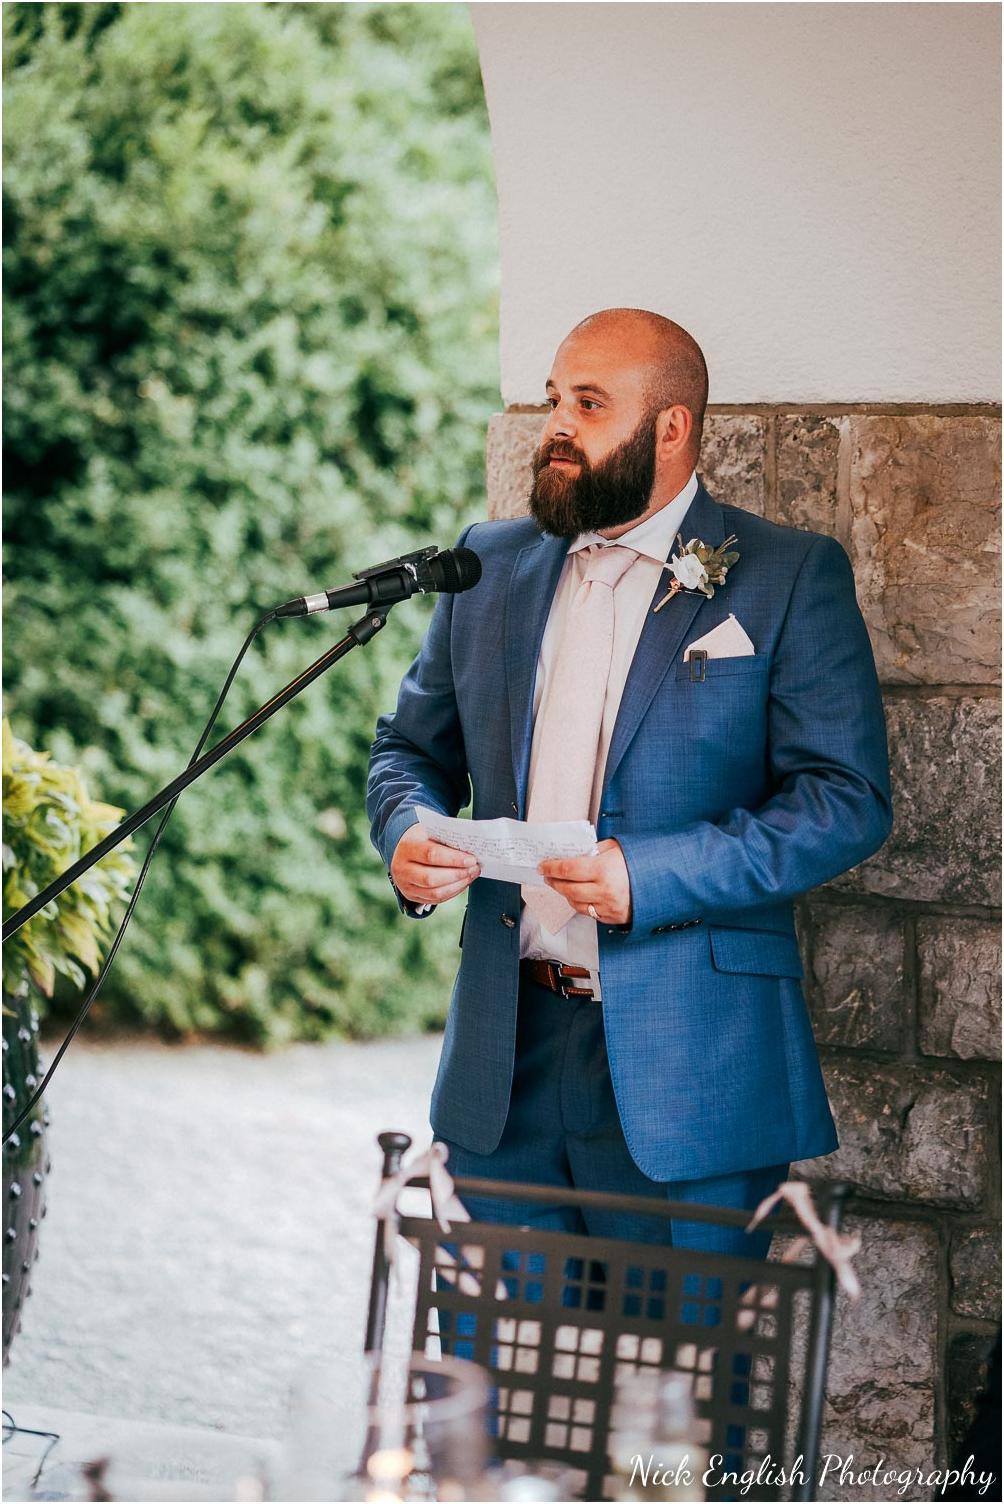 Destination_Wedding_Photographer_Slovenia_Nick_English_Photography-77.jpg